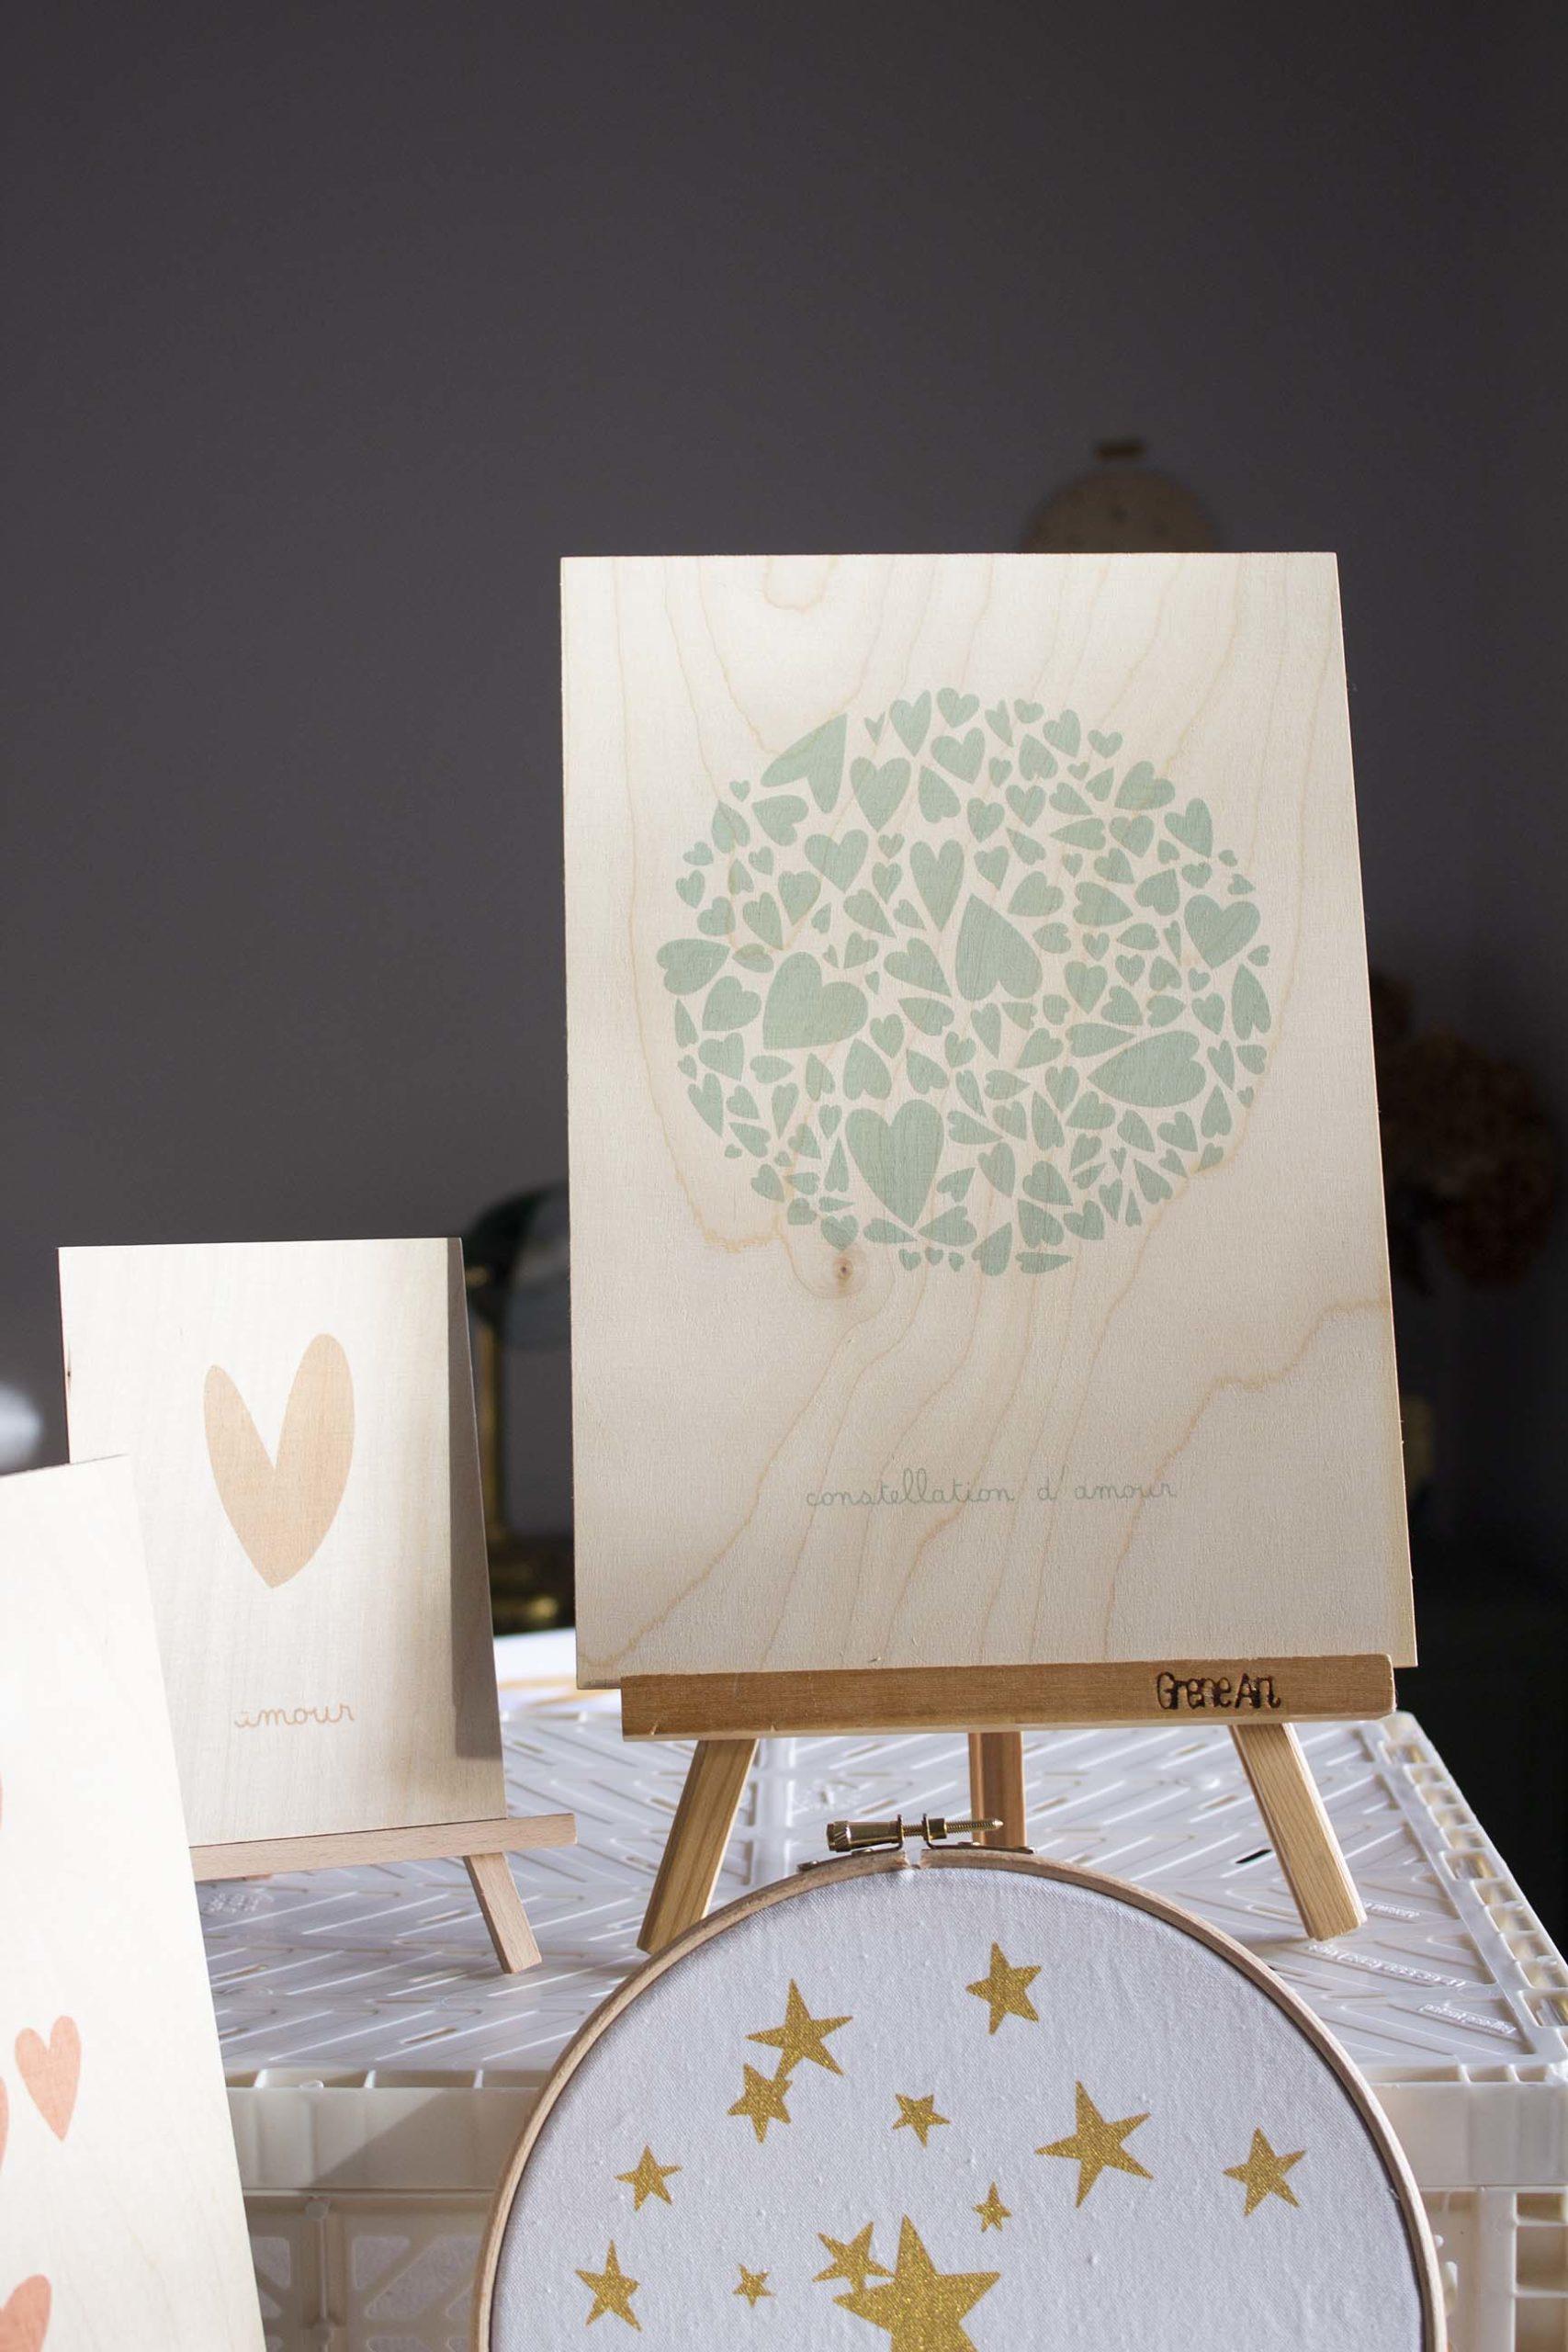 Affiche-A4-bois-constellationdamour-vertdeau-latelierdesorg-decoration